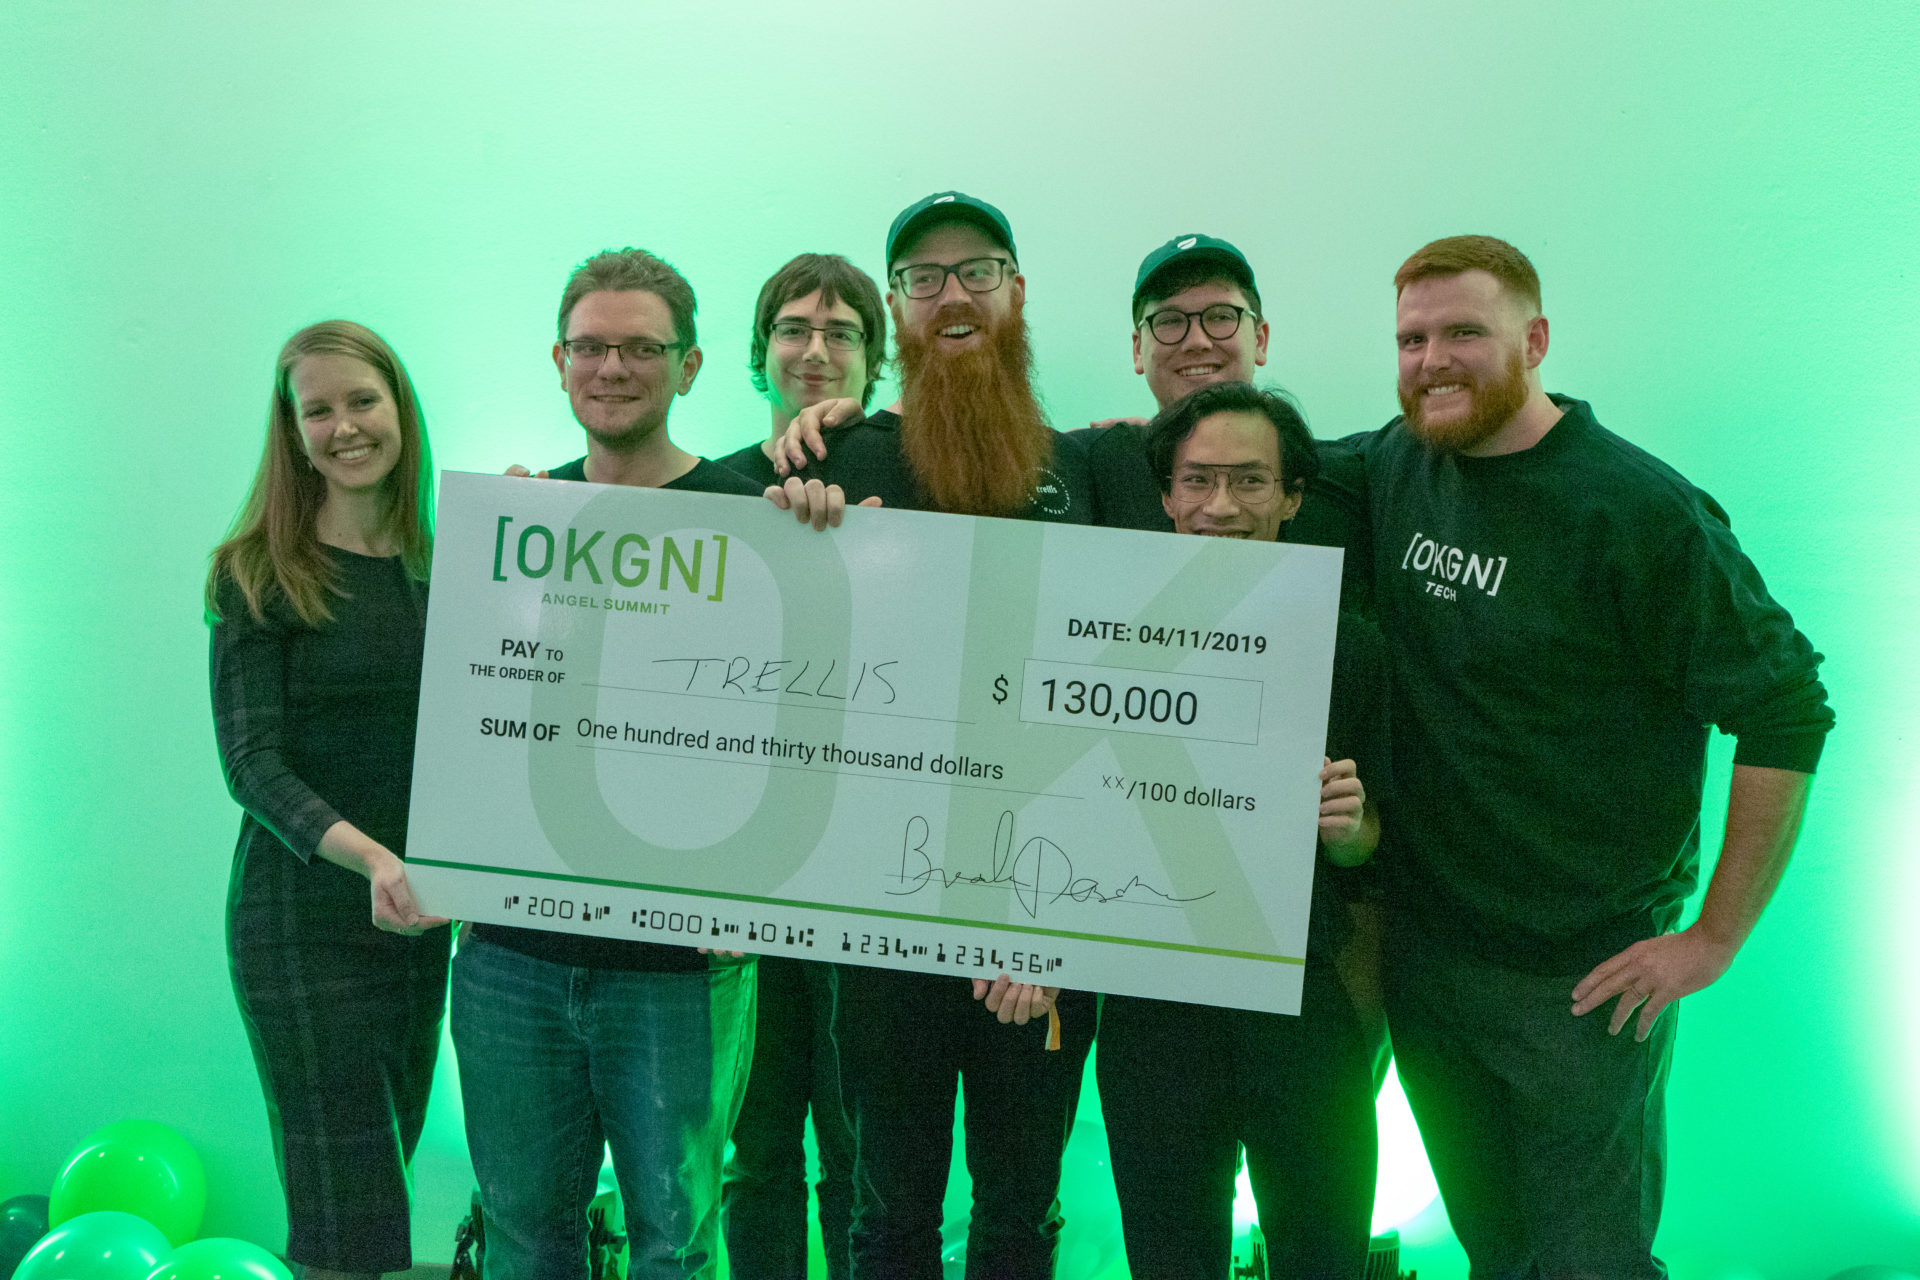 Trellis social enterprise wins $130,000 grand prize at okgn angel summit